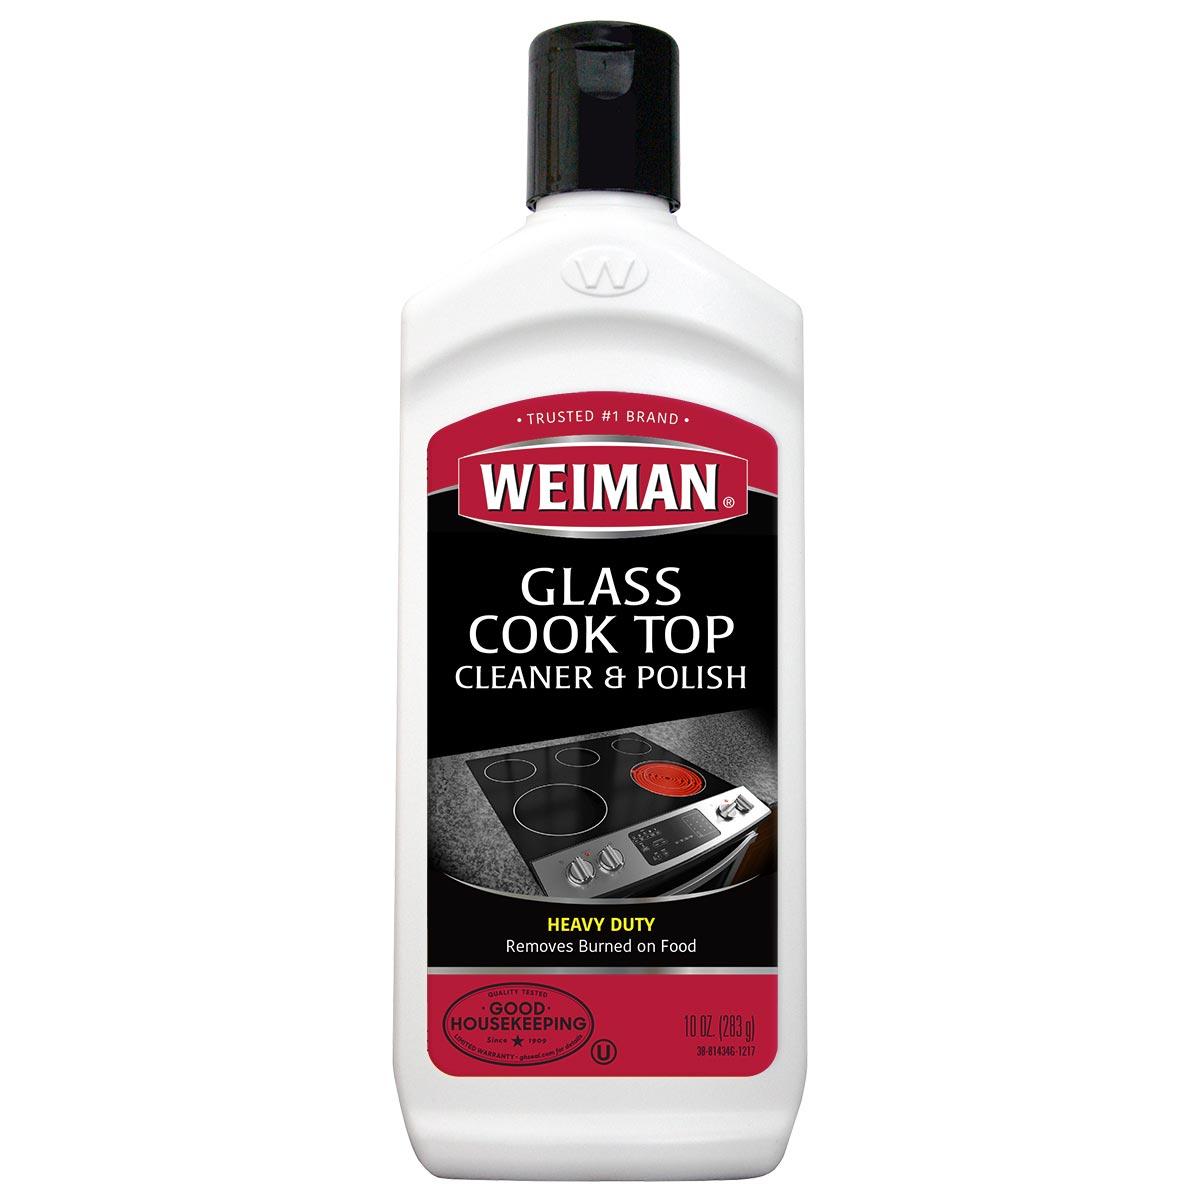 https://googone.com/media/catalog/product/w/e/weiman-cooktop-cleaner_front.jpg